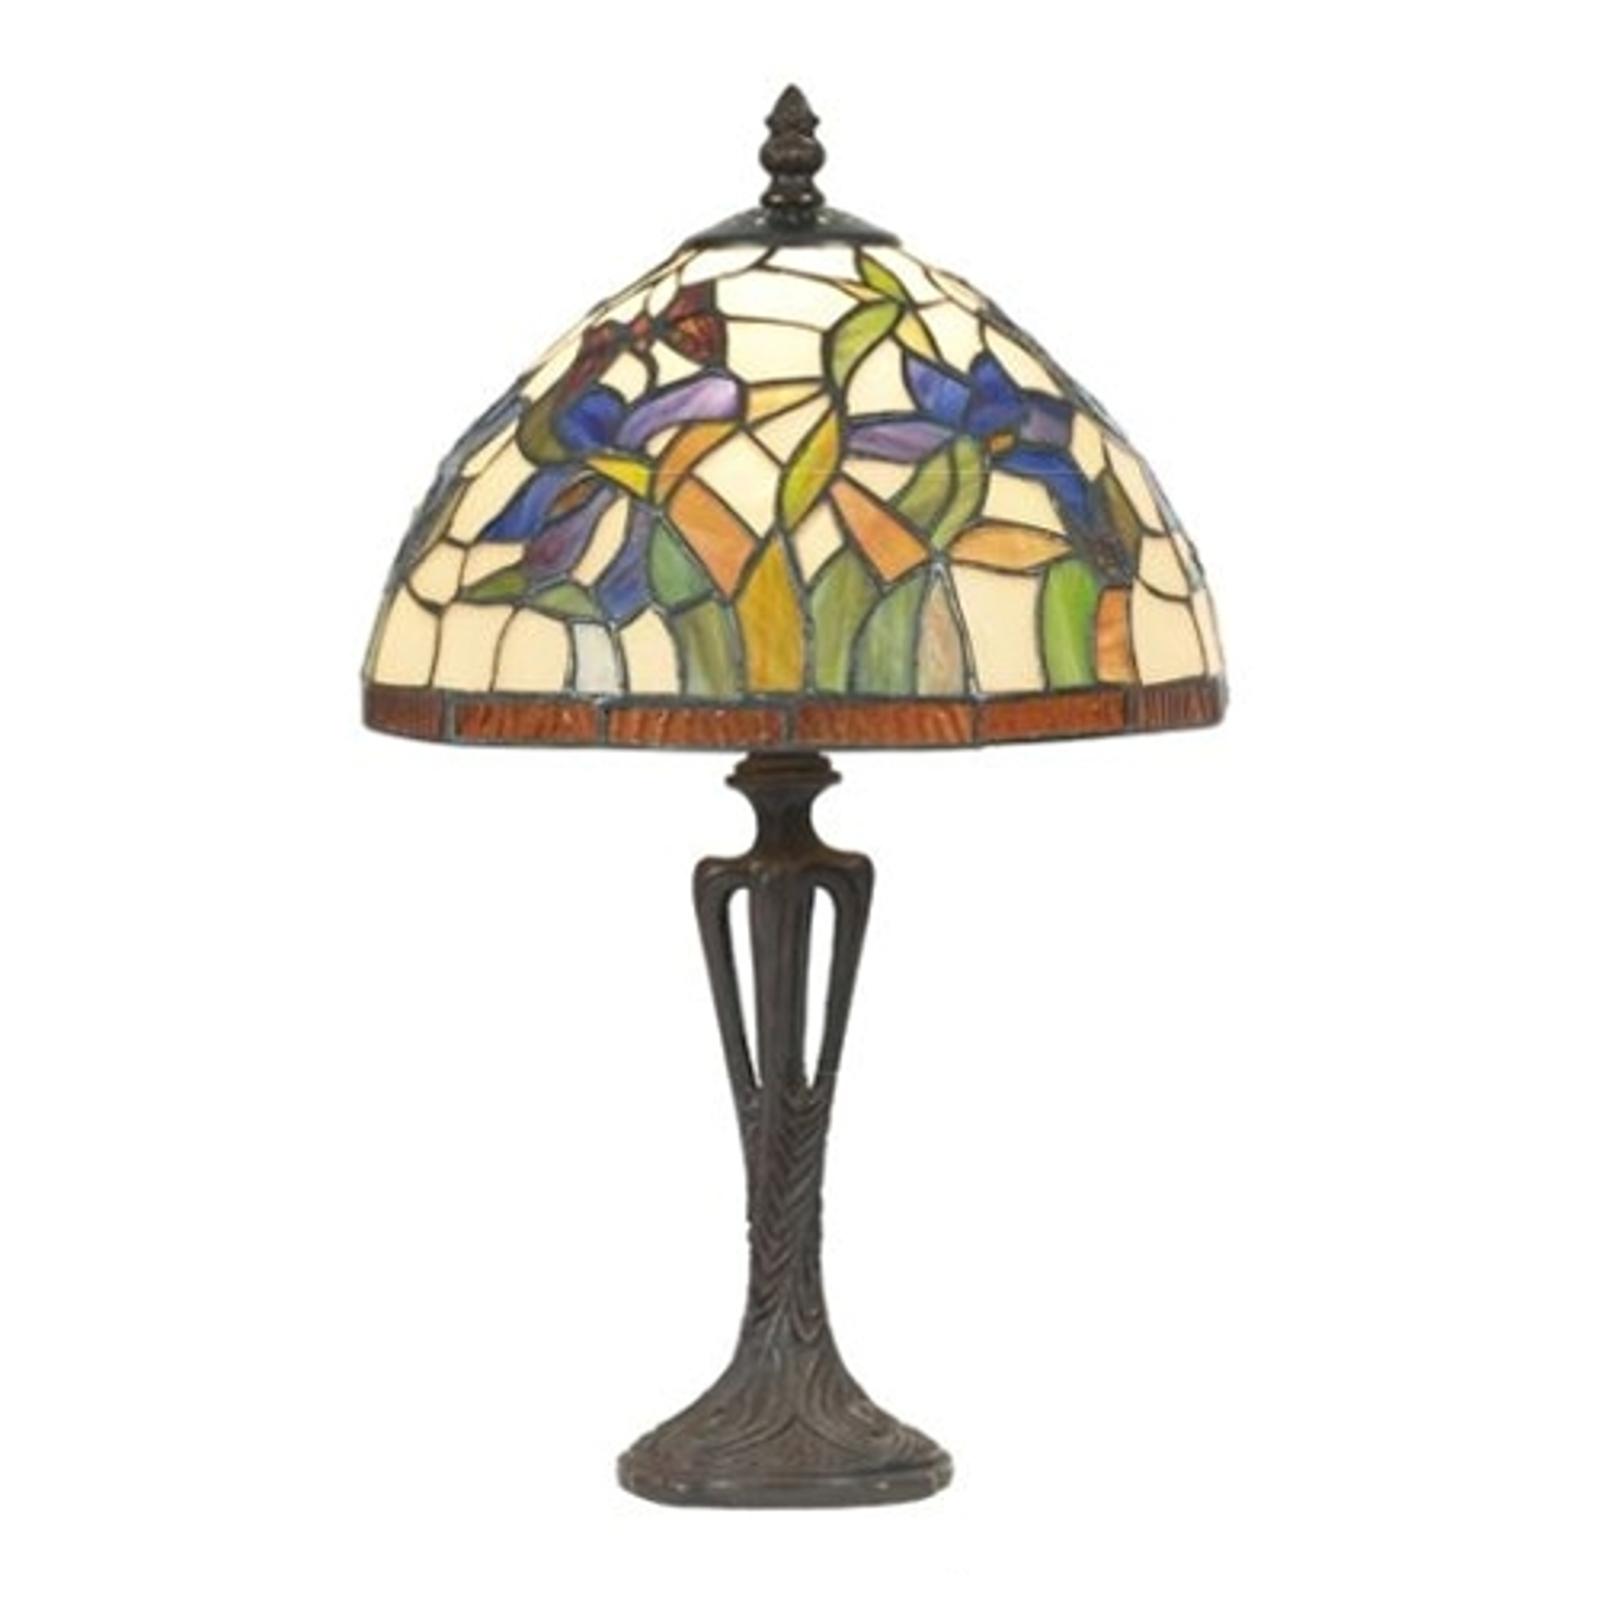 Discreet table lamp ELANDA, Tiffany-style, 41 cm_1032161_1